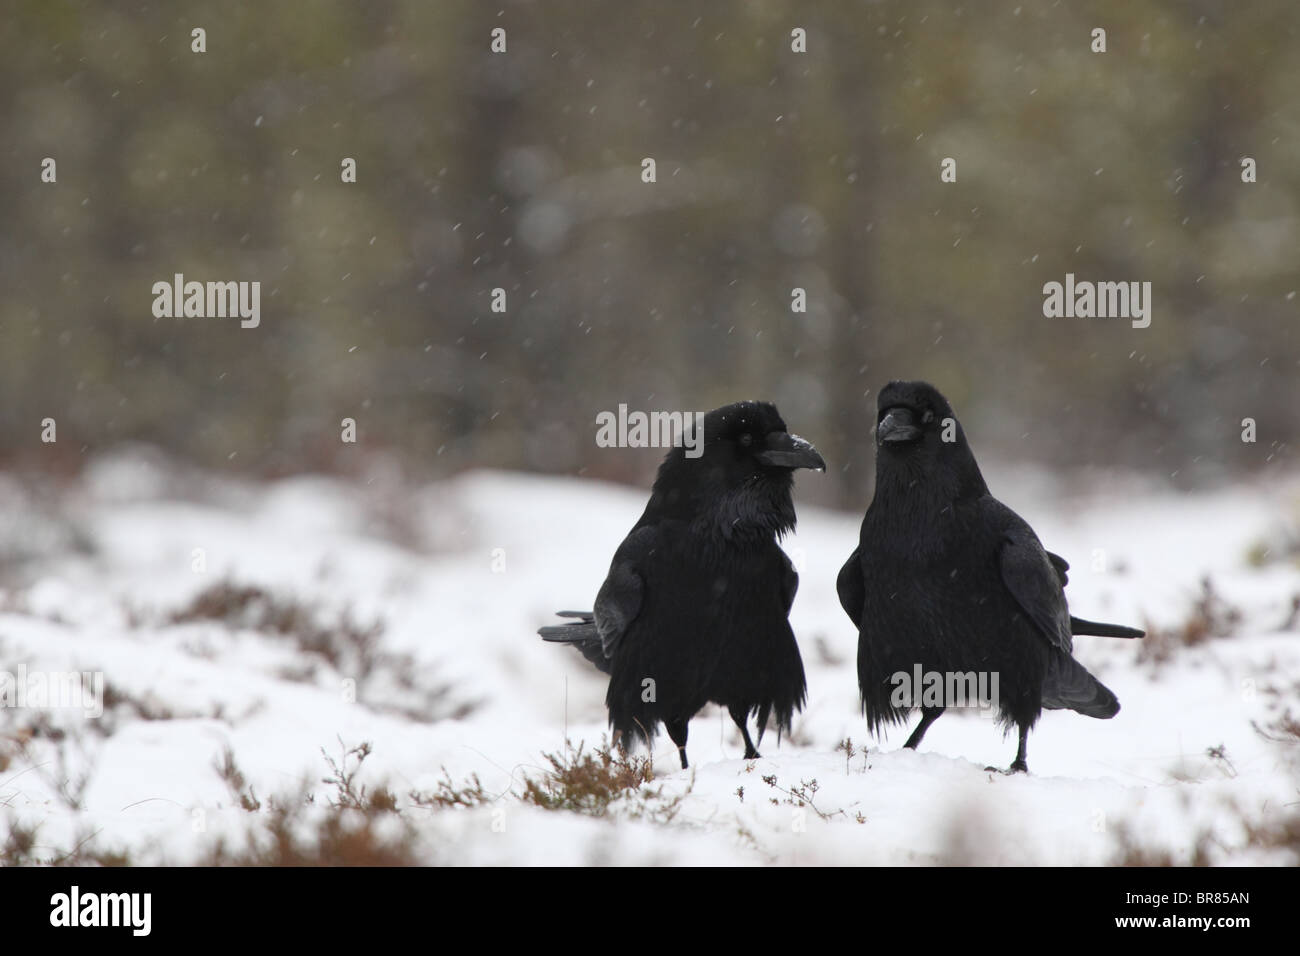 Kolkrabe (Corvus Corax) in Schneefall den Hof. Paarungszeit. Stockbild